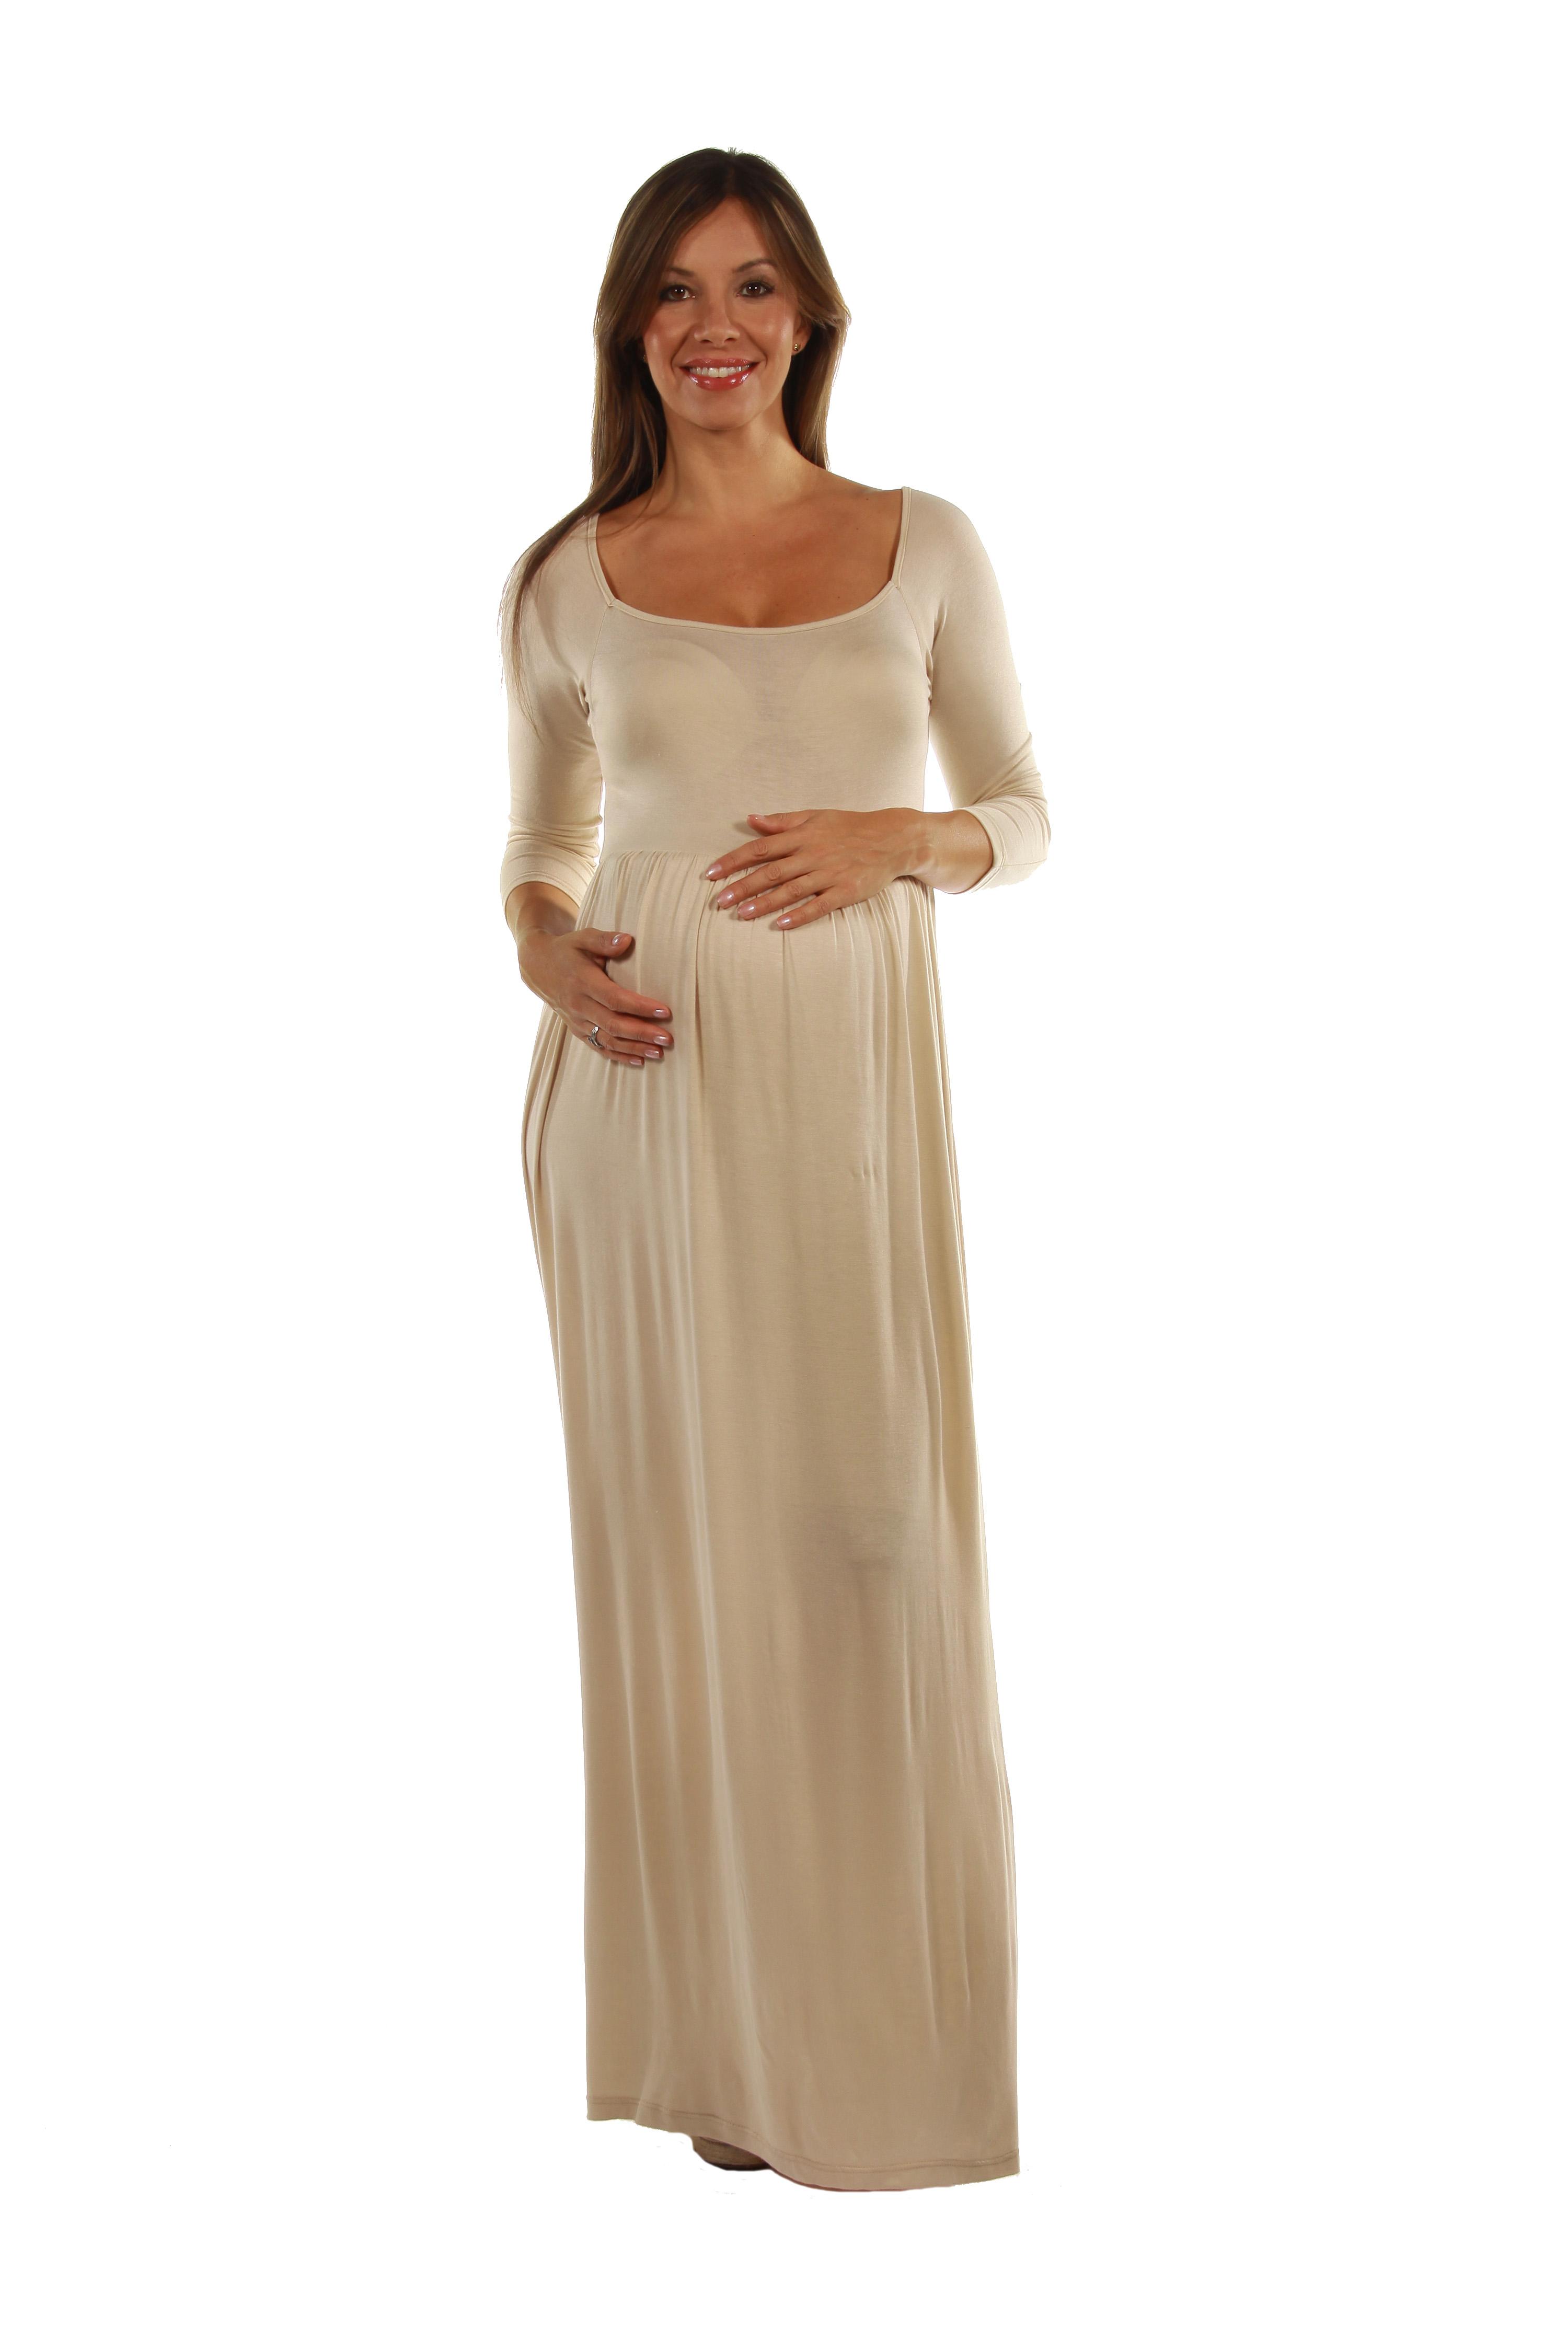 24  47 7 Comfort Apparel Empire Waist Long Sleeve Maternity Maxi Dress 0e68dd60498a